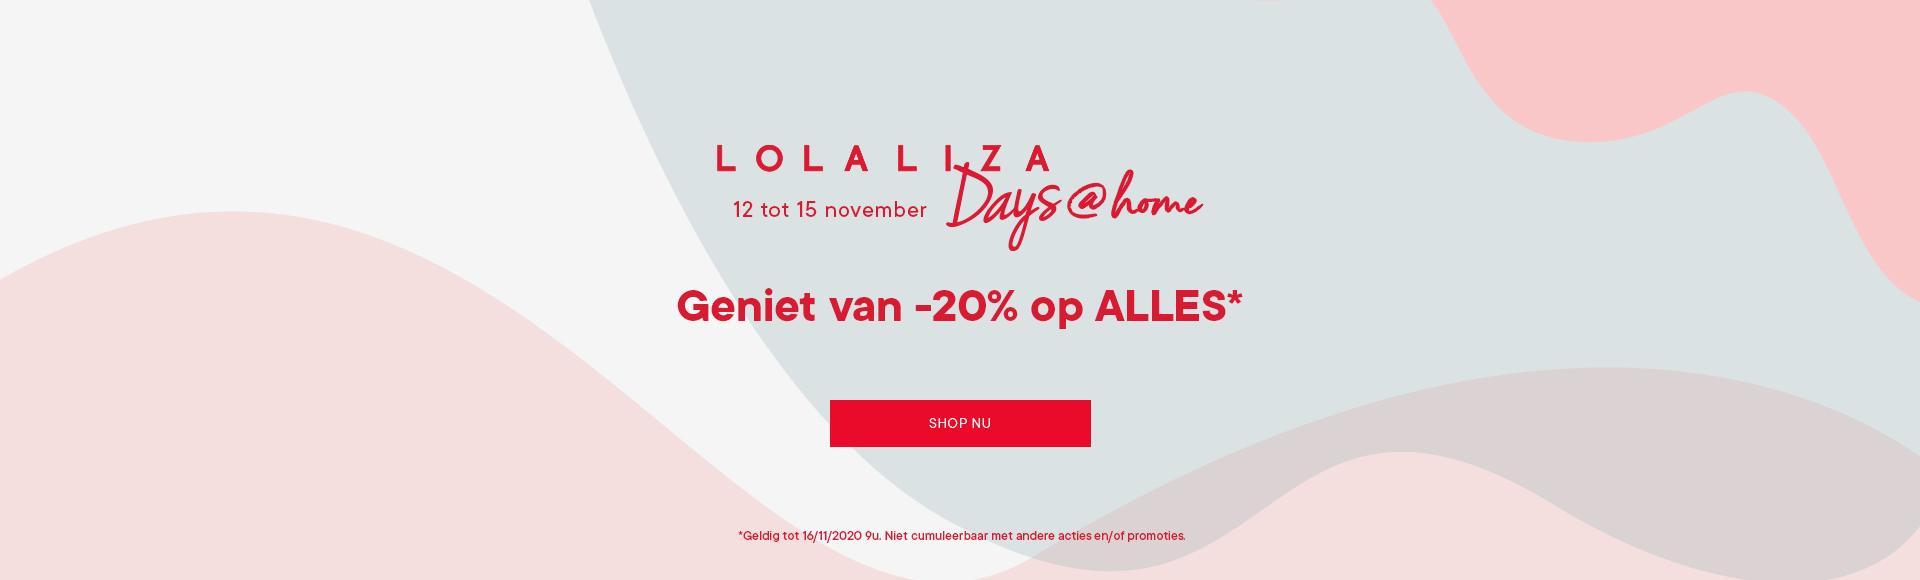 Lolaliza days